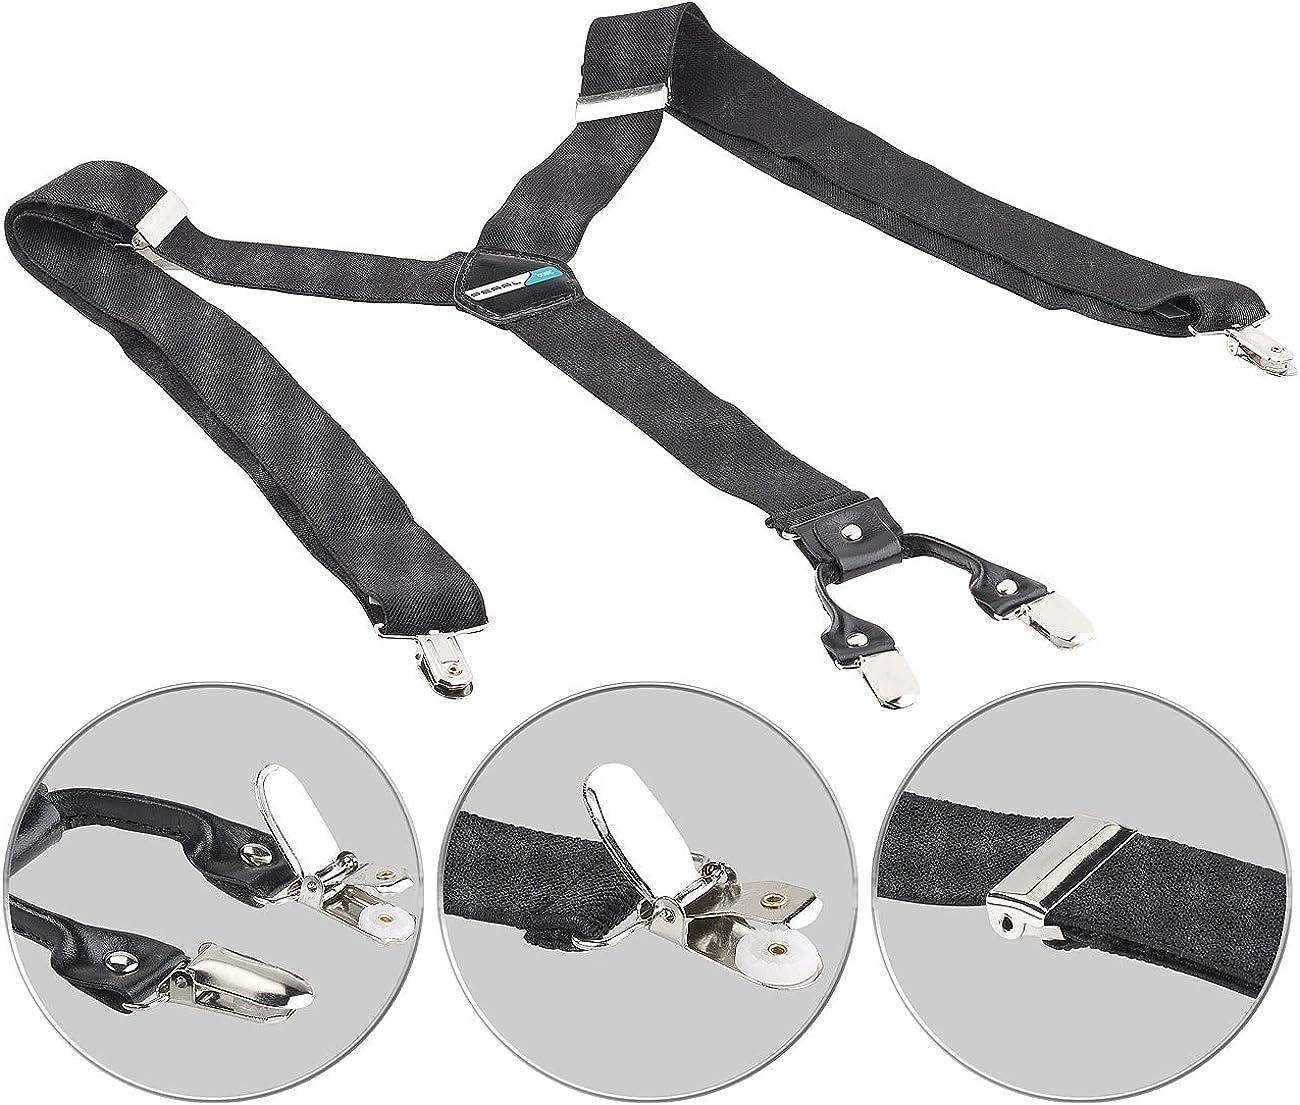 PEARL basic extra Breite Hosentr/äger: Breite Hosentr/äger 4 Clips Echtleder-Applikation schwarz Y-Form Suspender